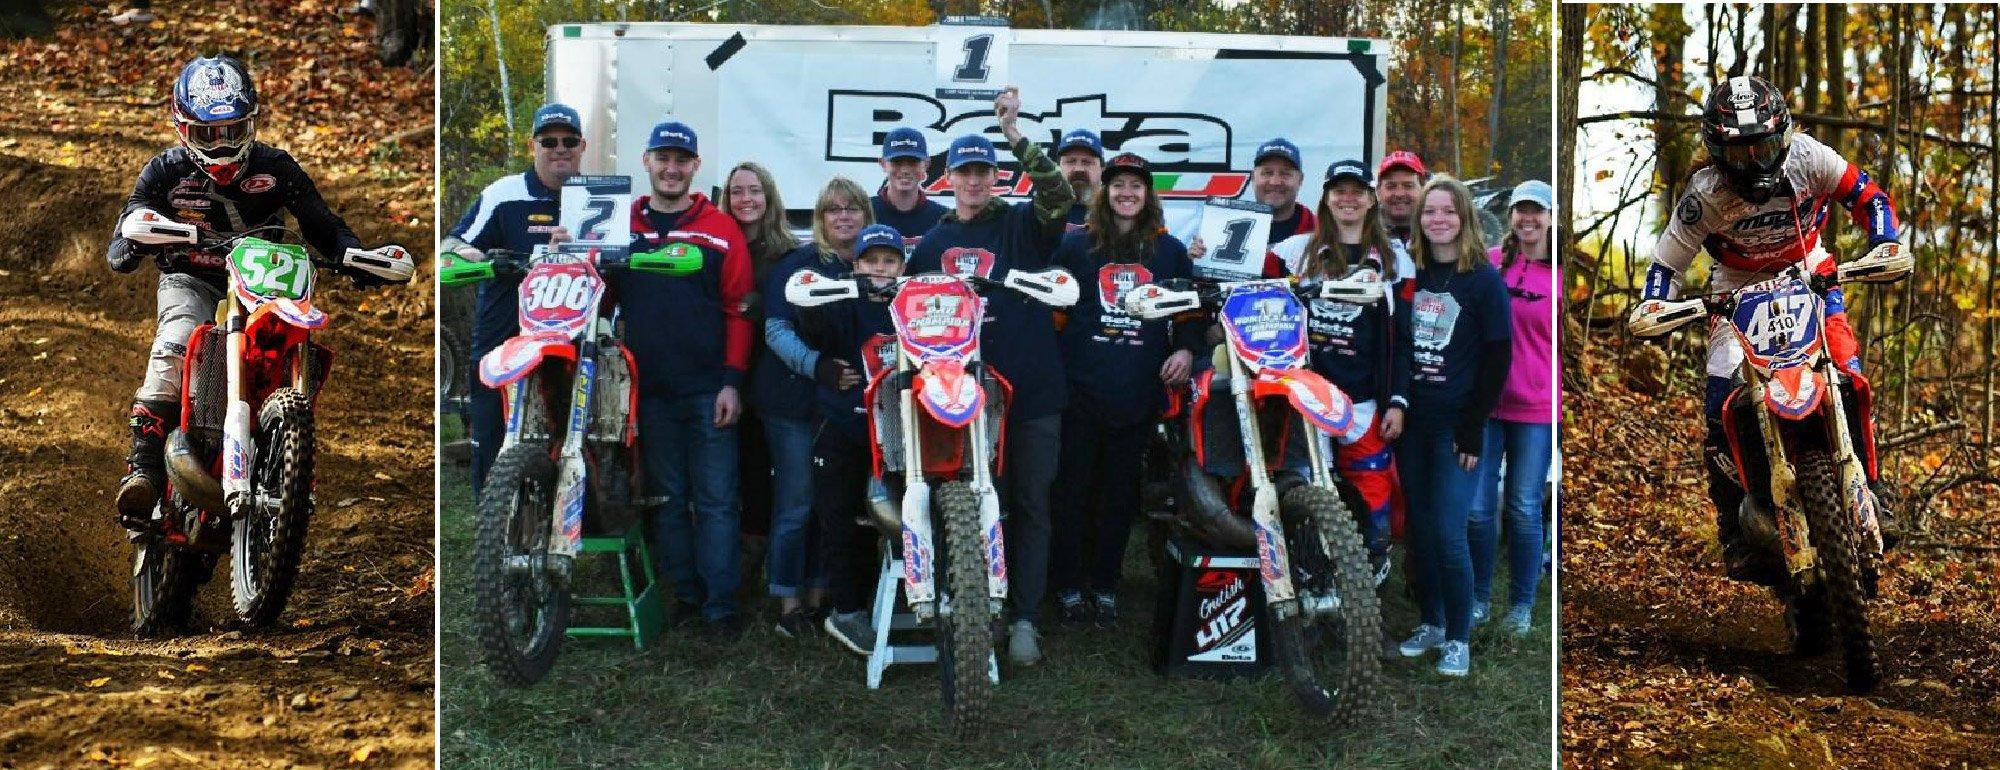 Beta motorcycle USA - Blog Championship Photo_Champ 5